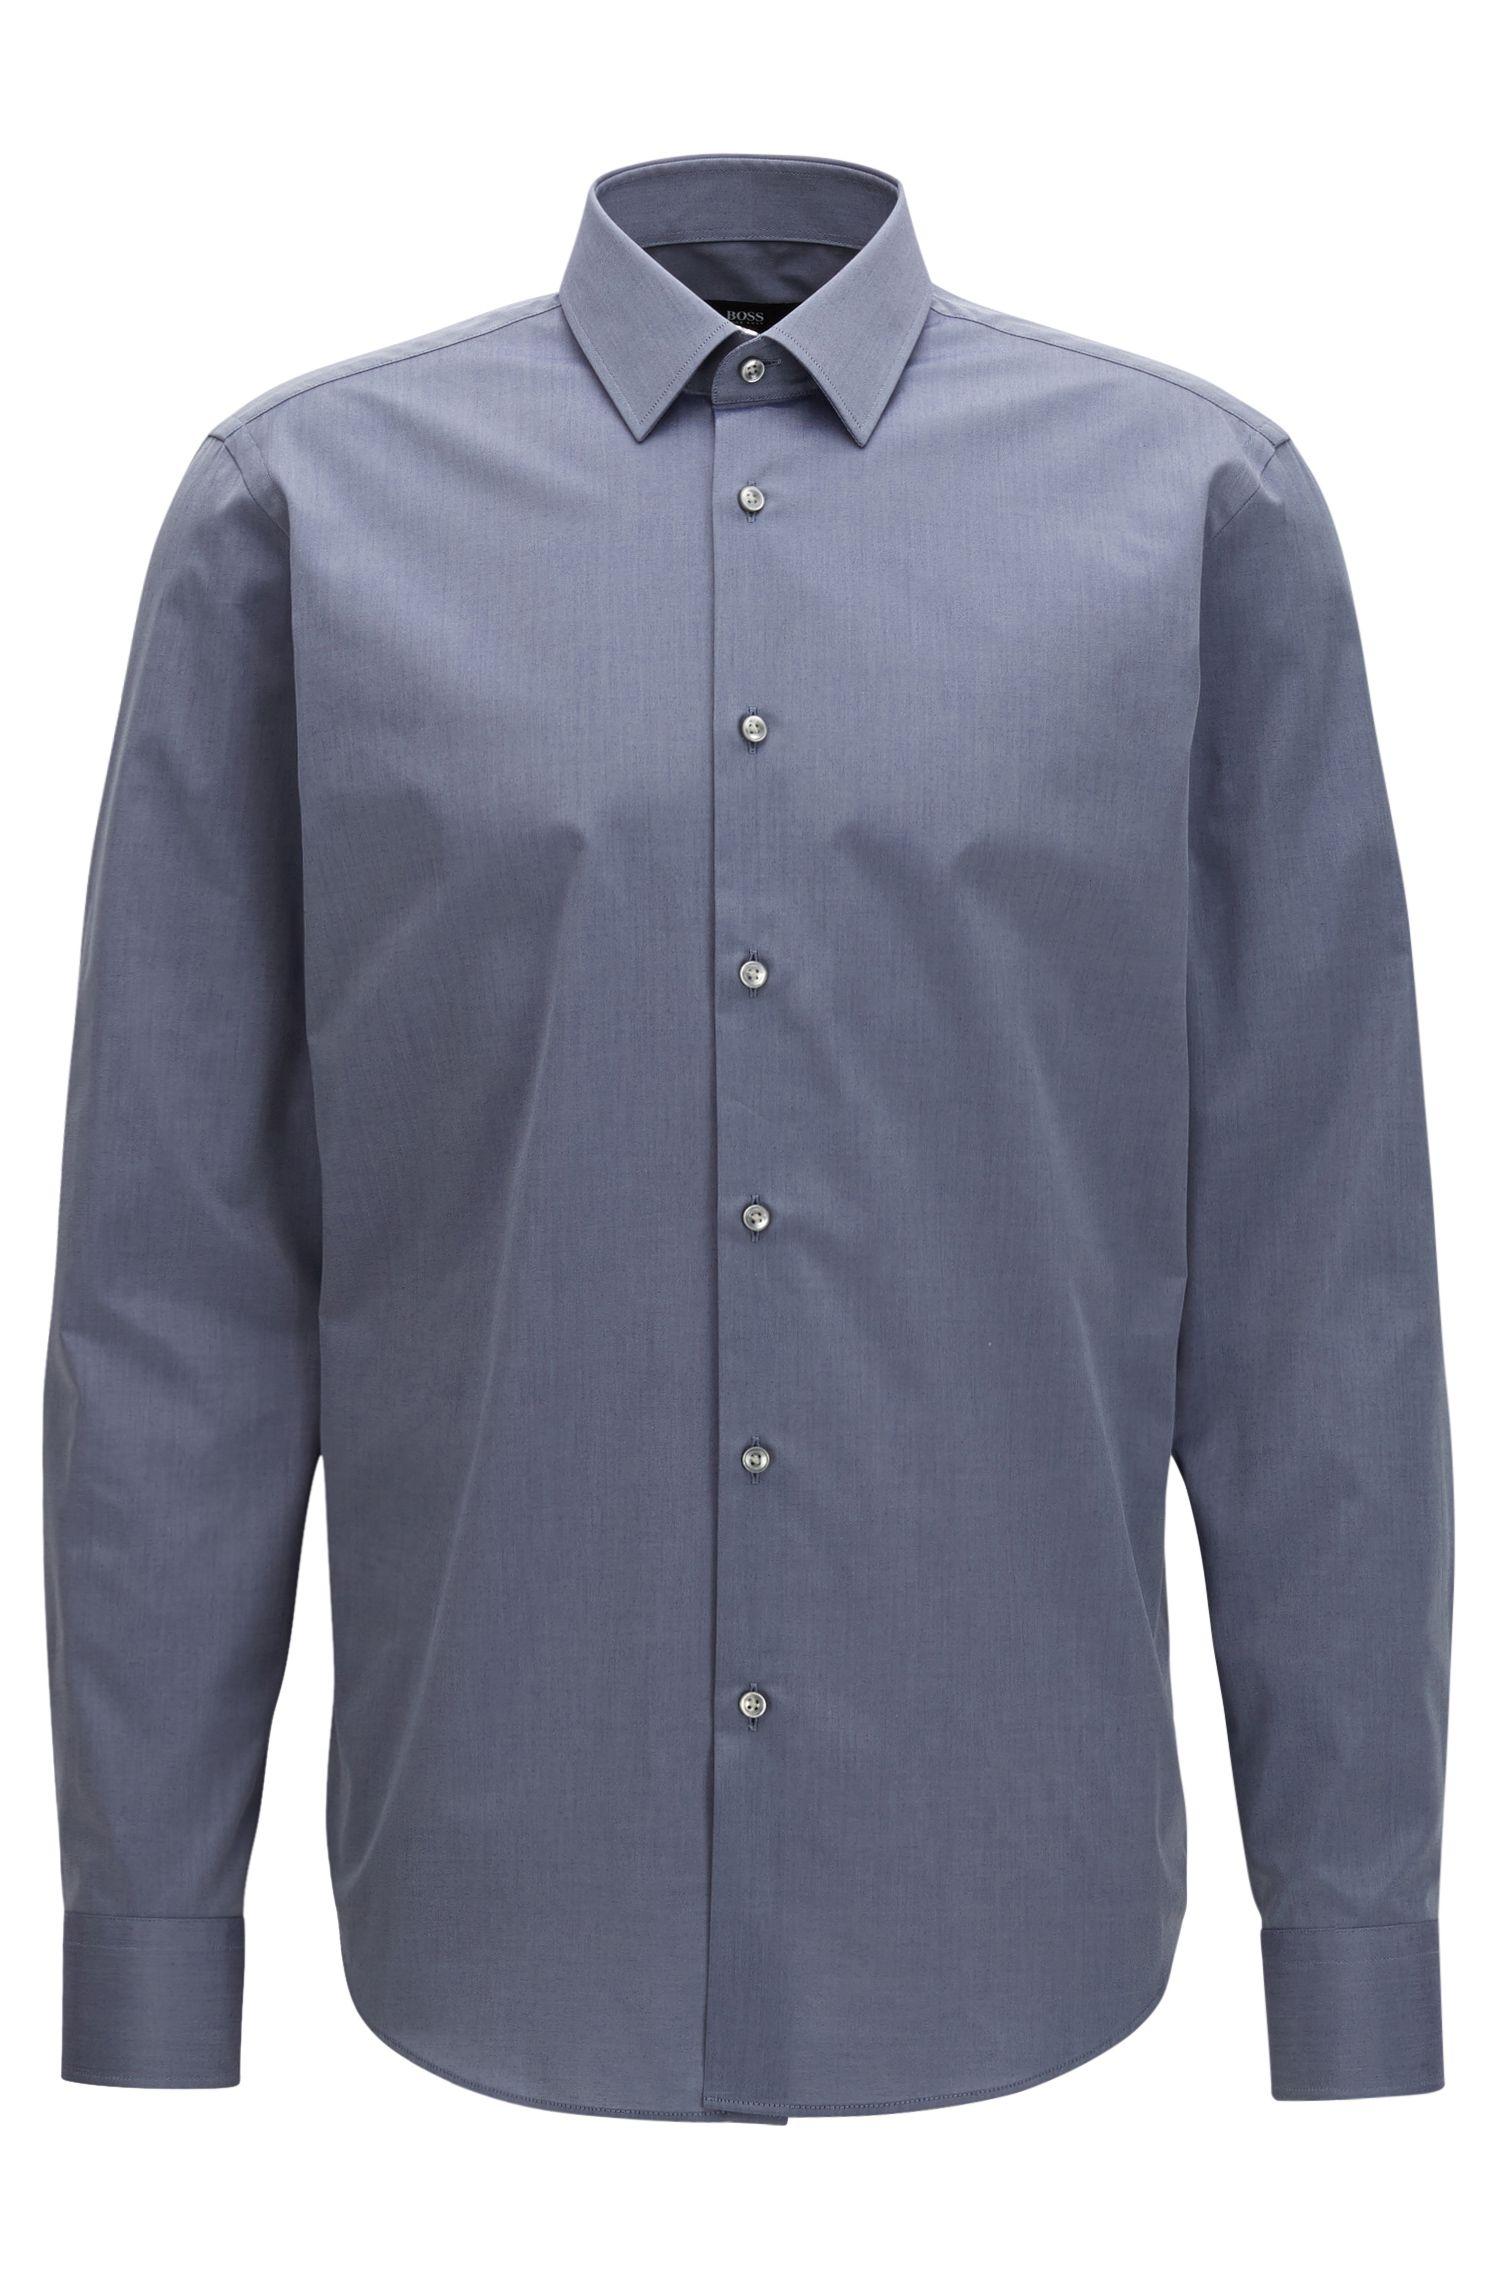 Chambray Cotton Dress Shirt, Regular Fit | Enzo